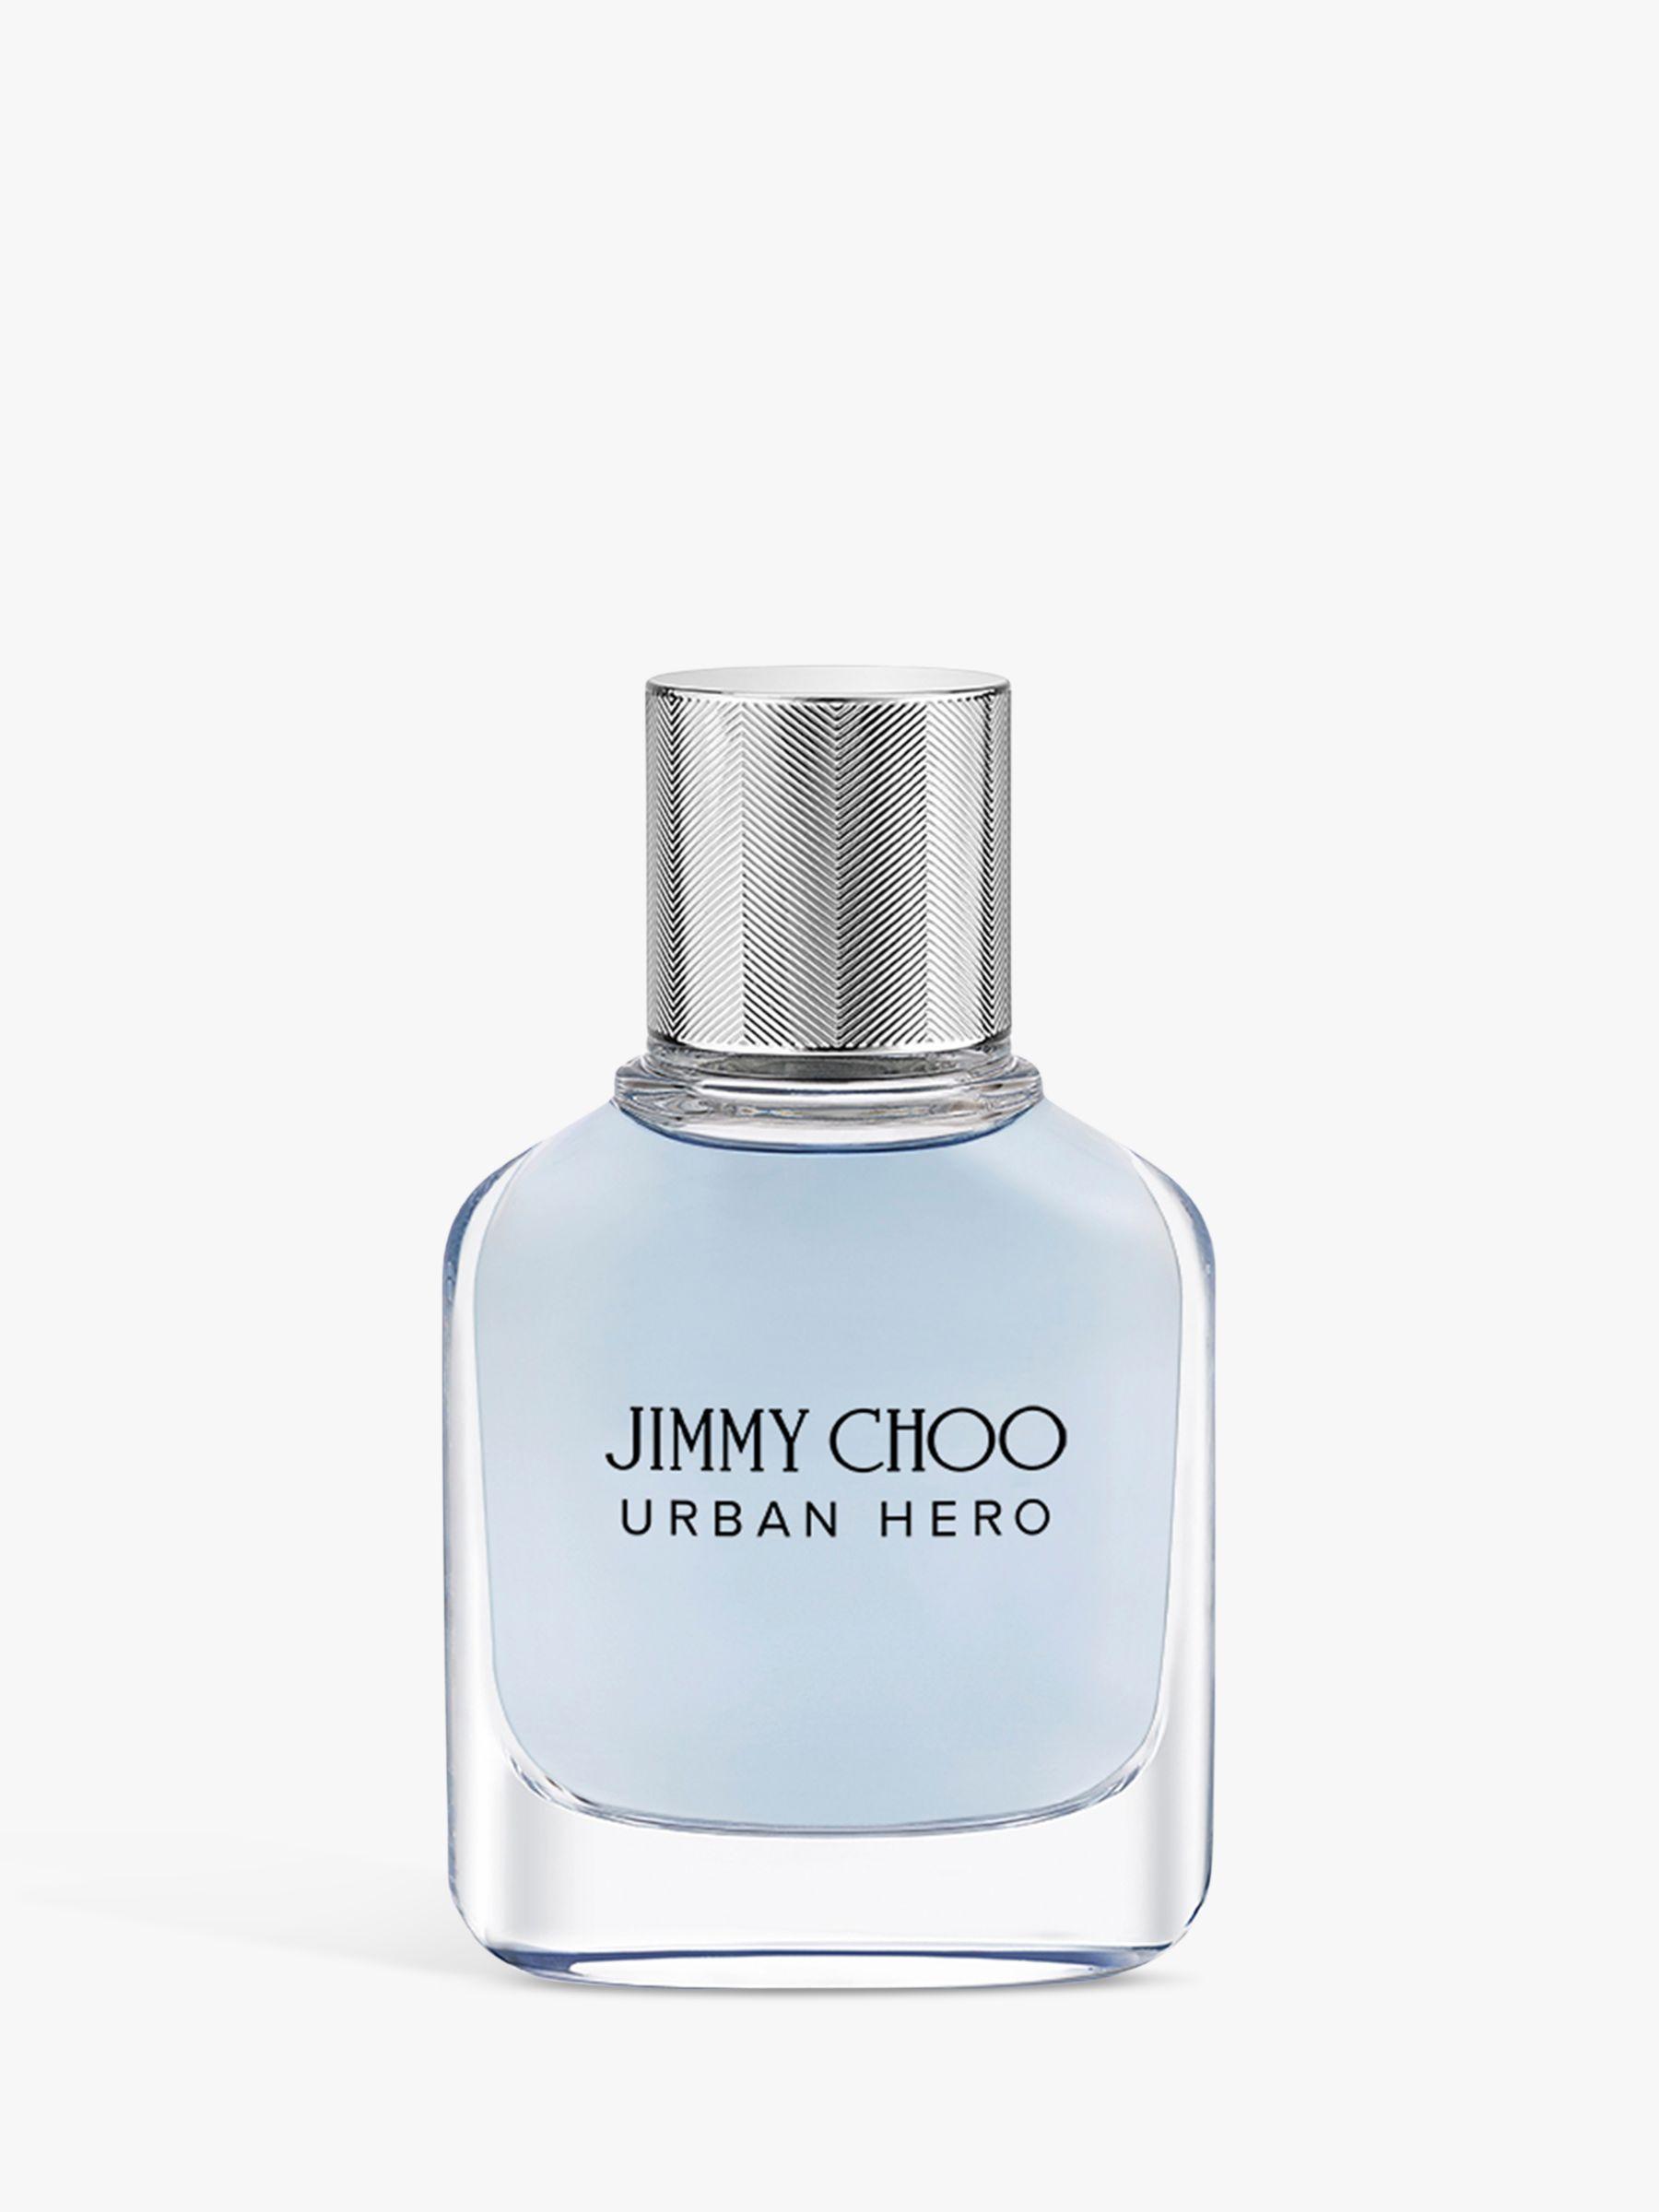 Jimmy Choo Jimmy Choo Urban Hero Eau de Parfum